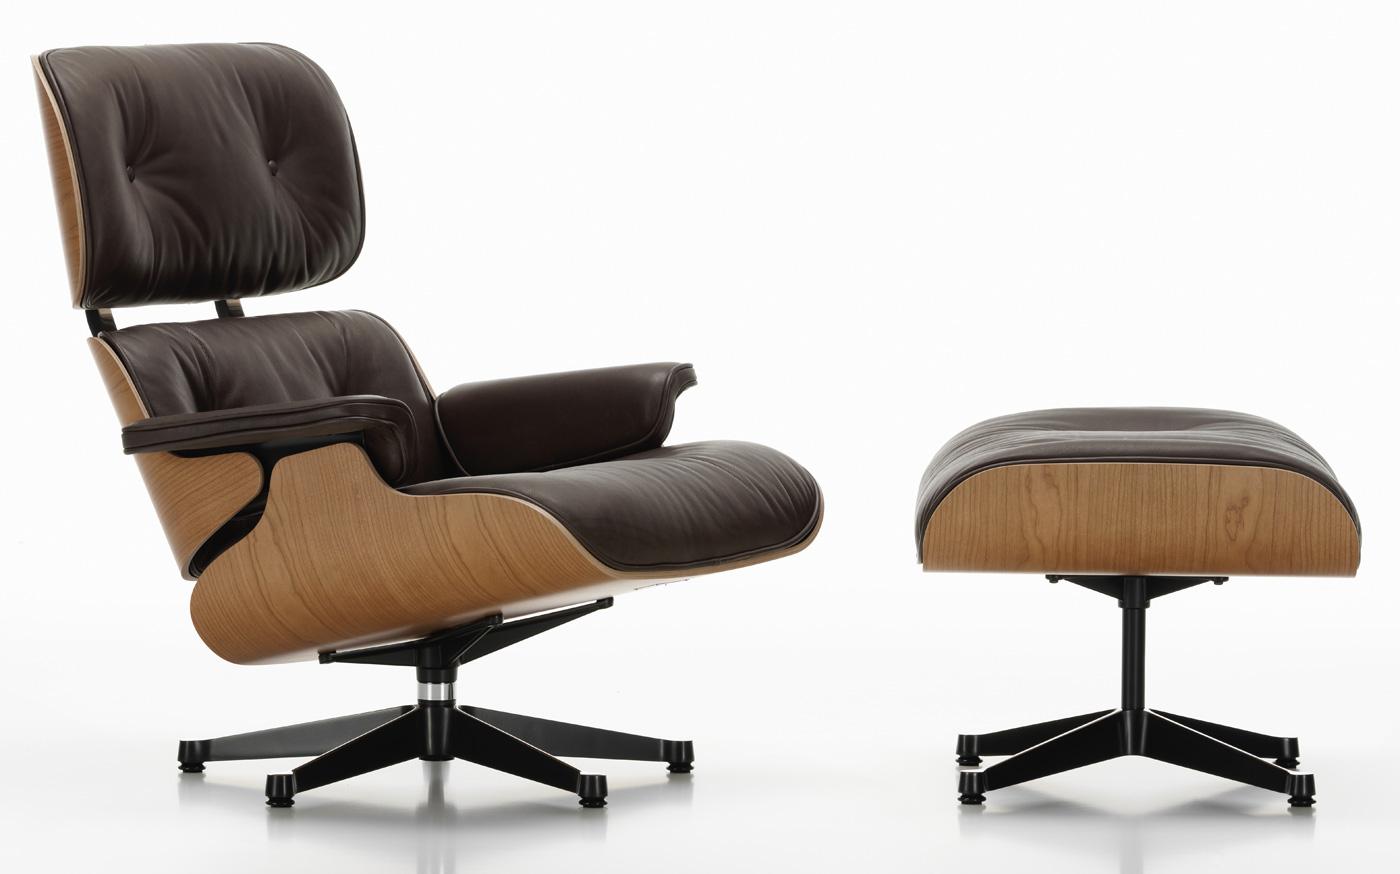 Eames Lounge Stoel : Lounge chair kirschbaum von charles und ray eames vitra markanto